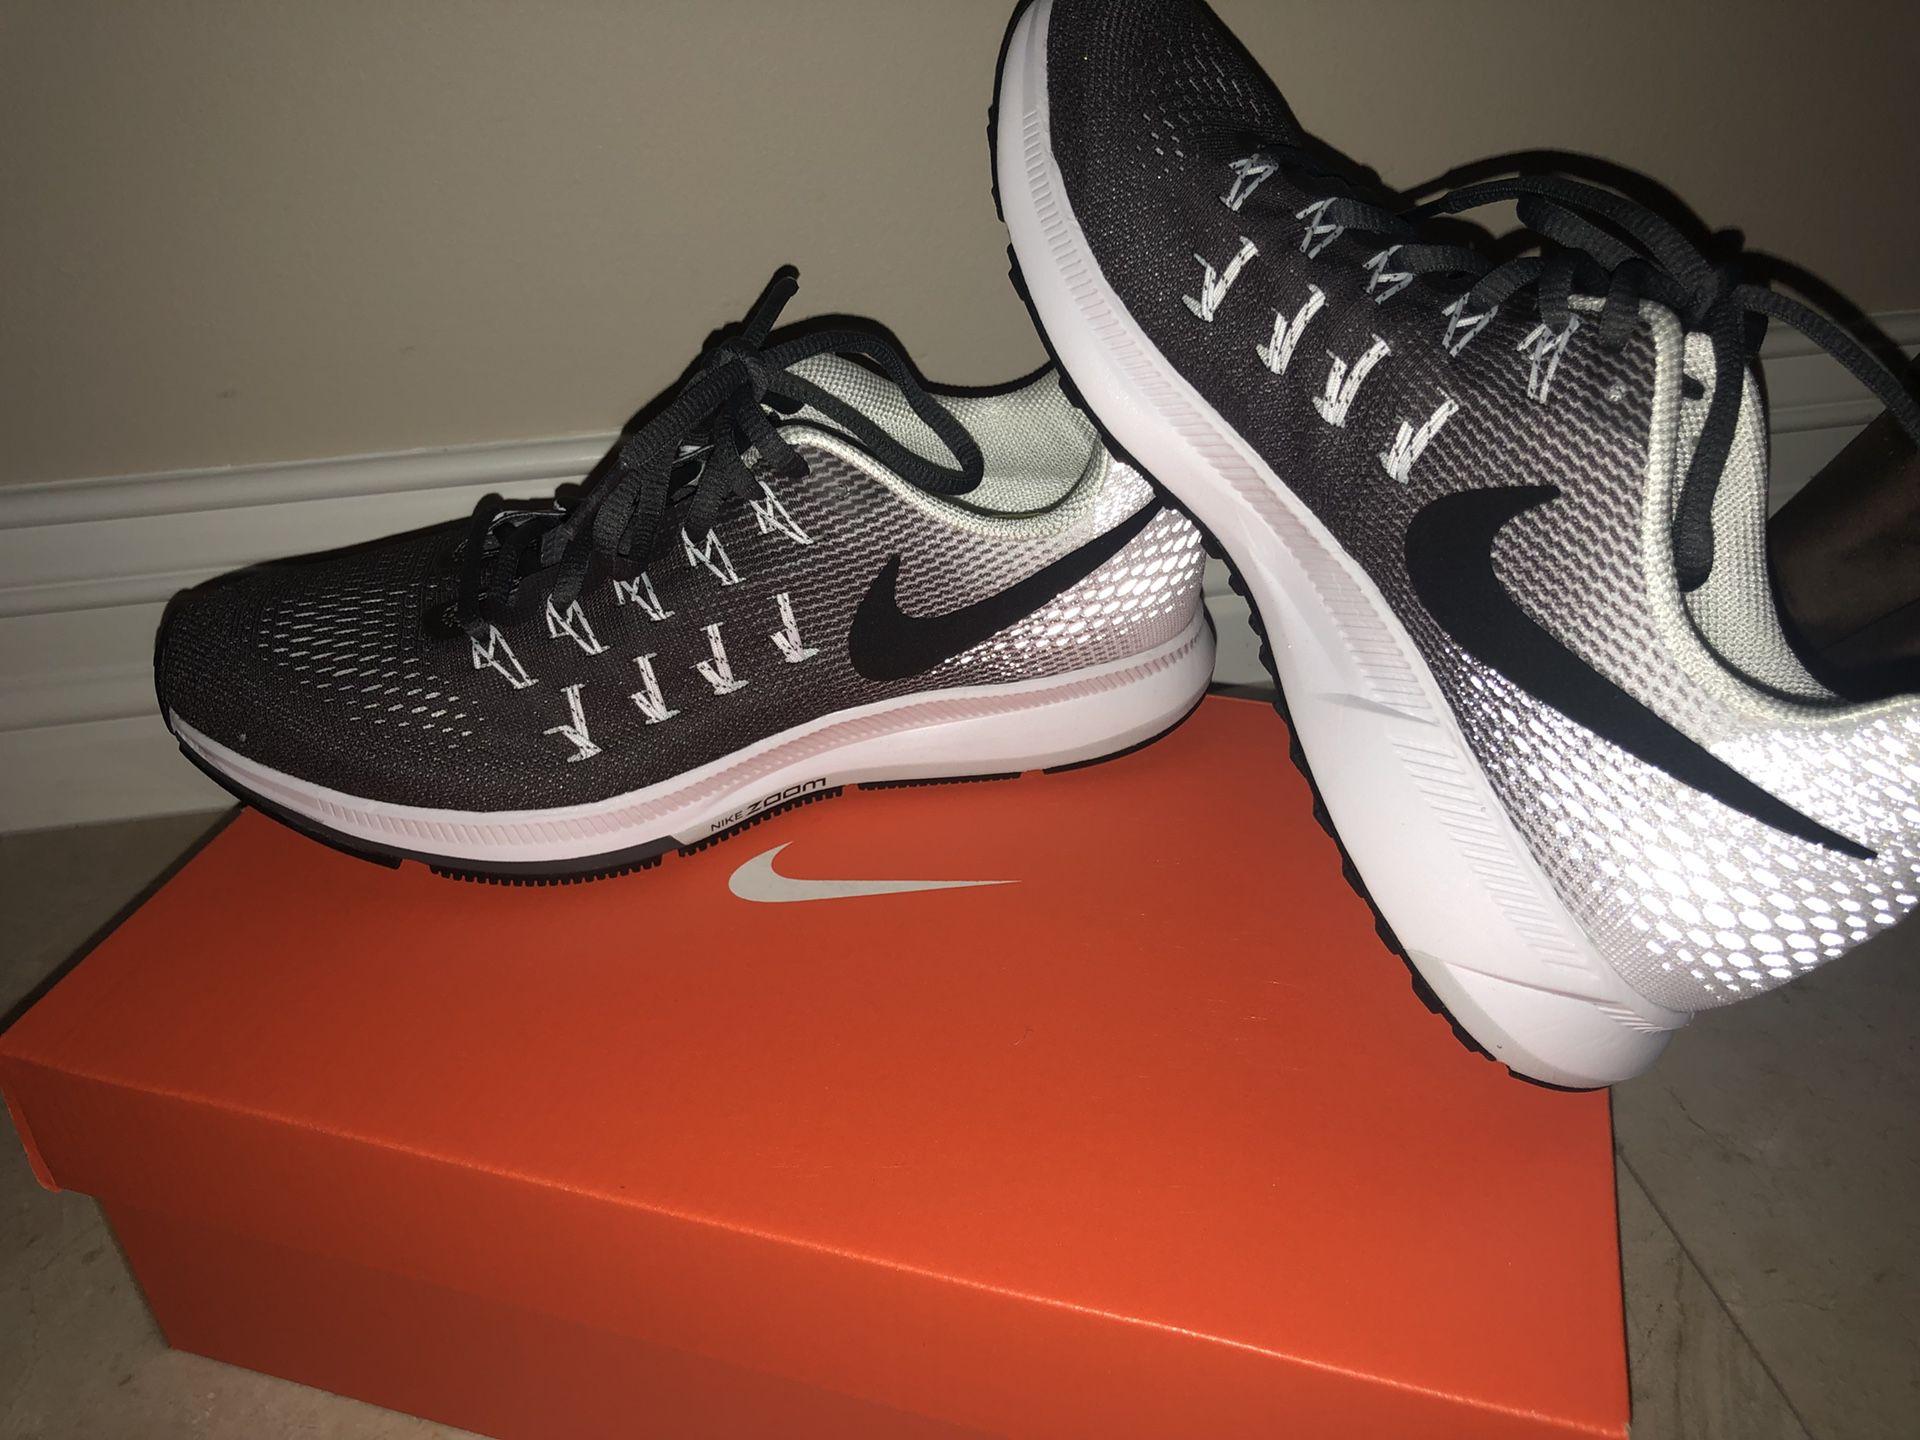 Women's Nike air zoom running/training shoes